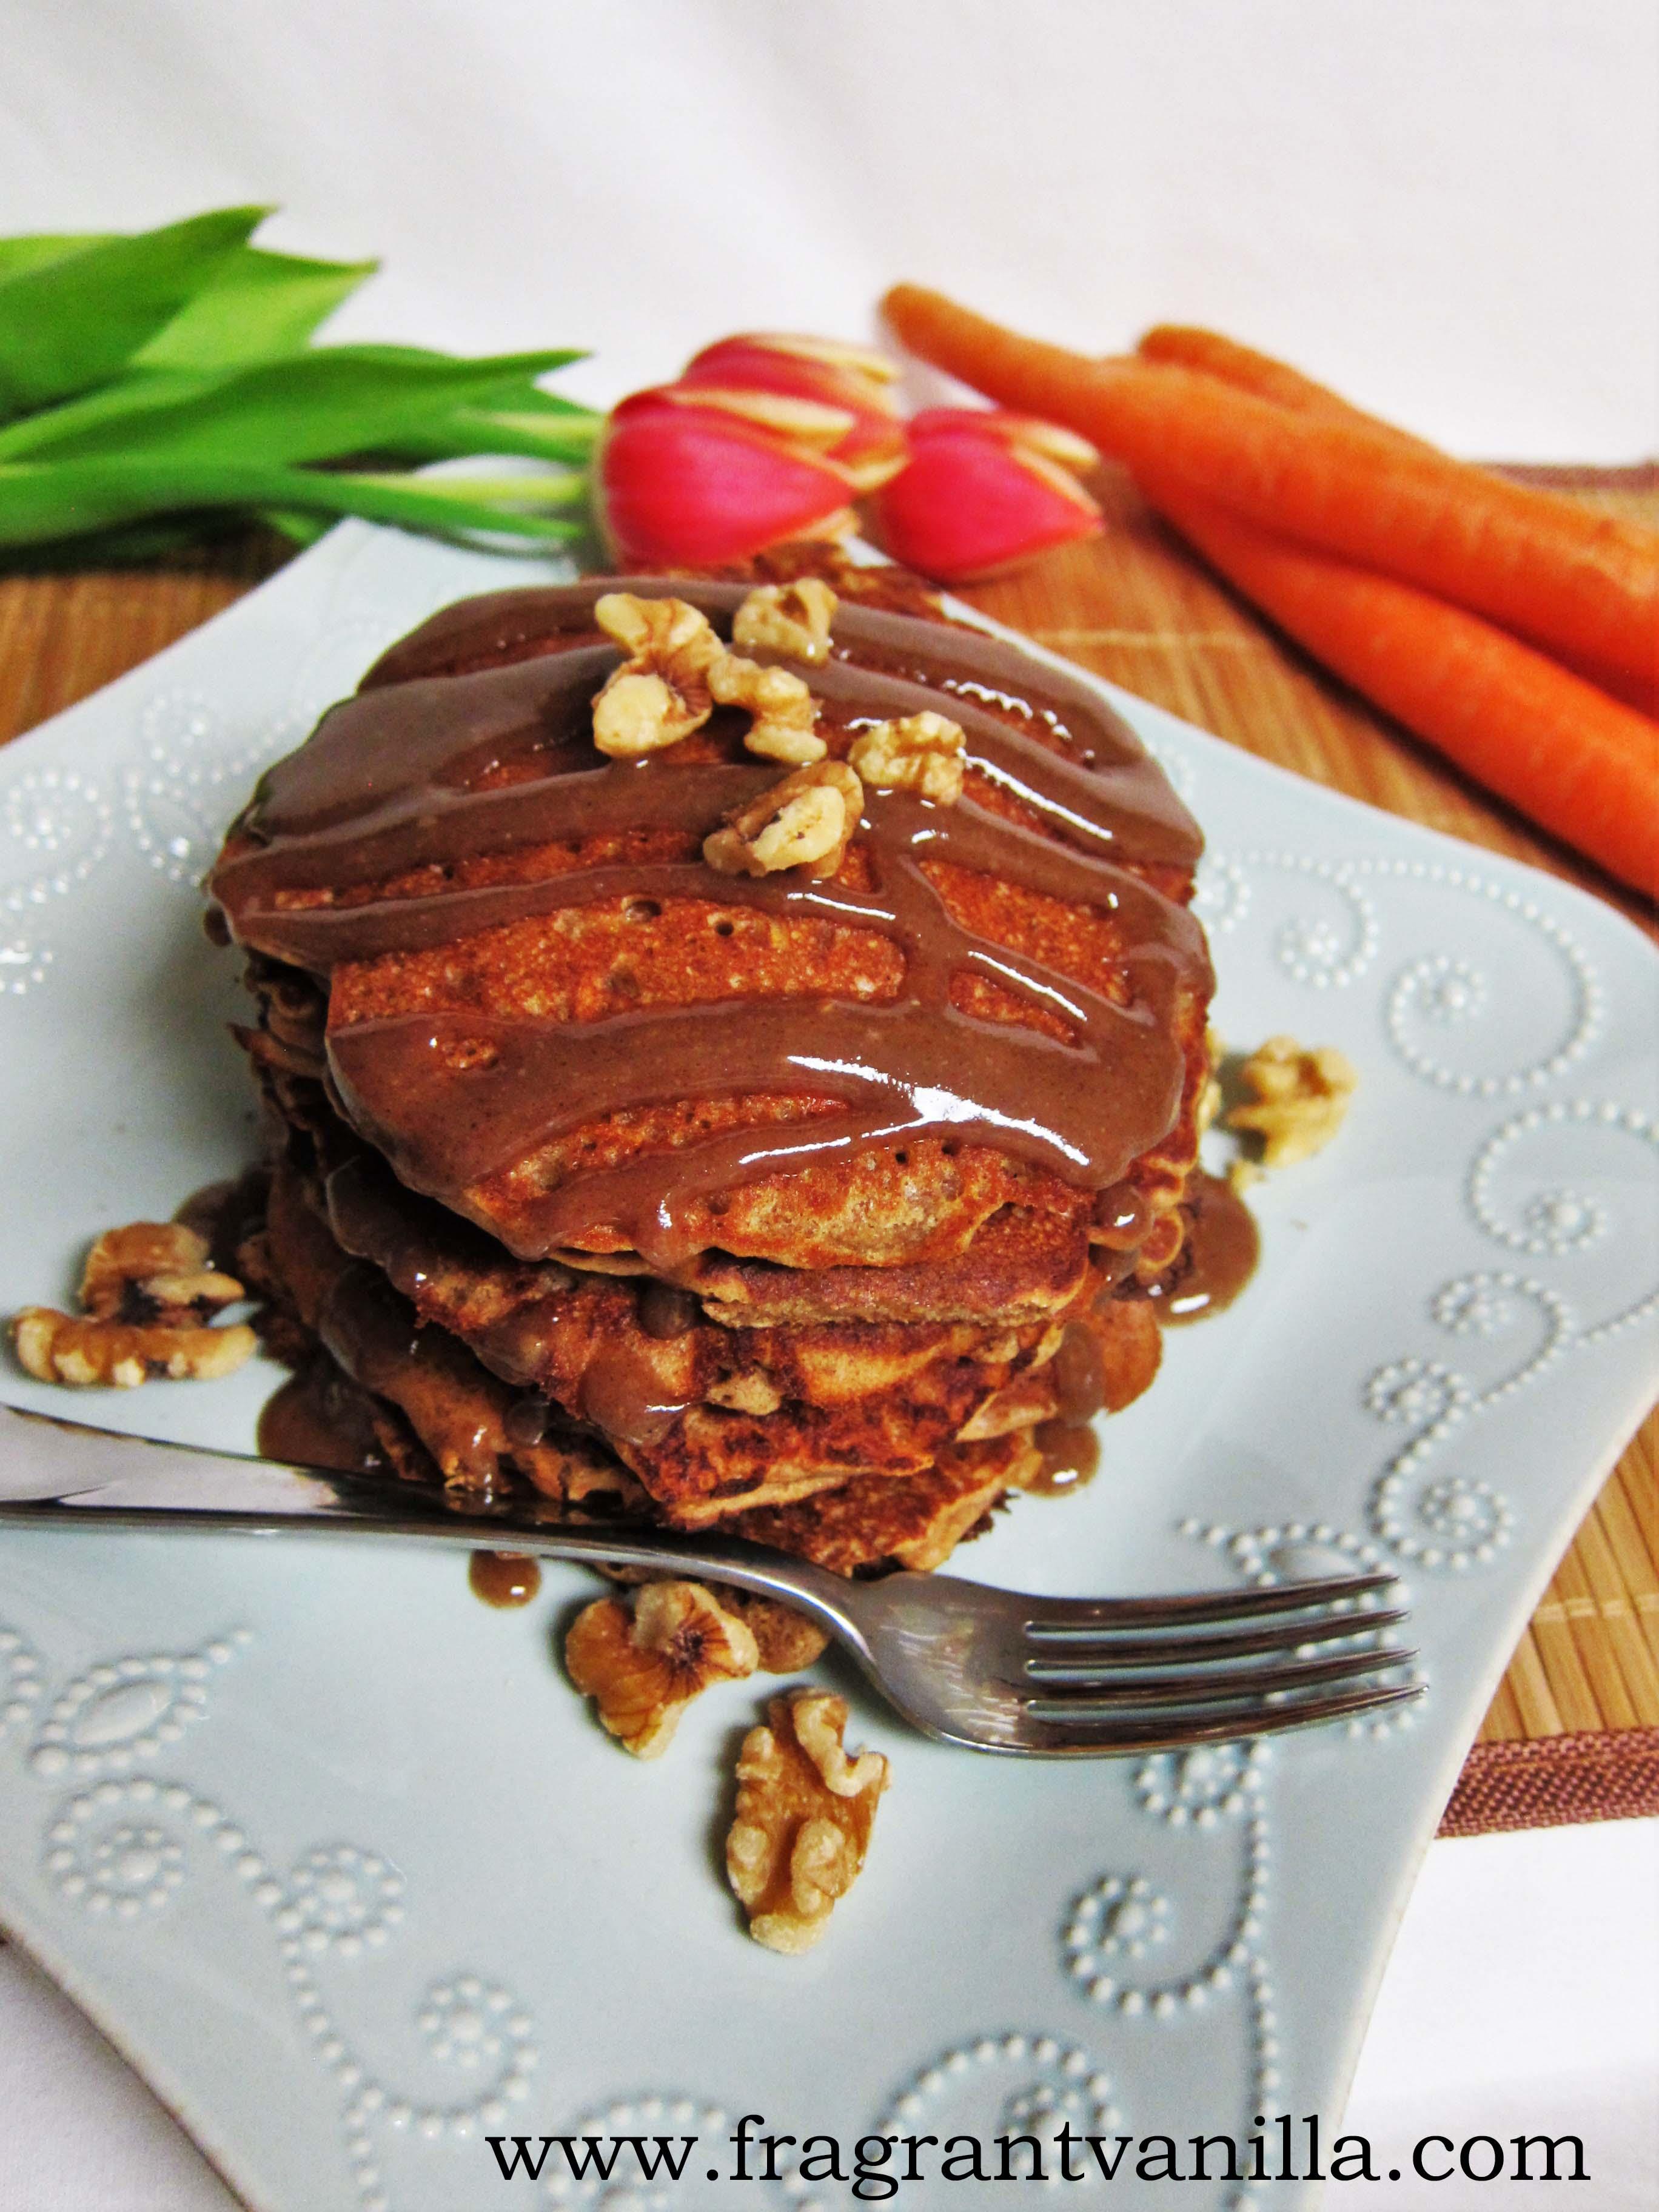 Vegan Carrot Cake Pancakes with Caramel Drizzle